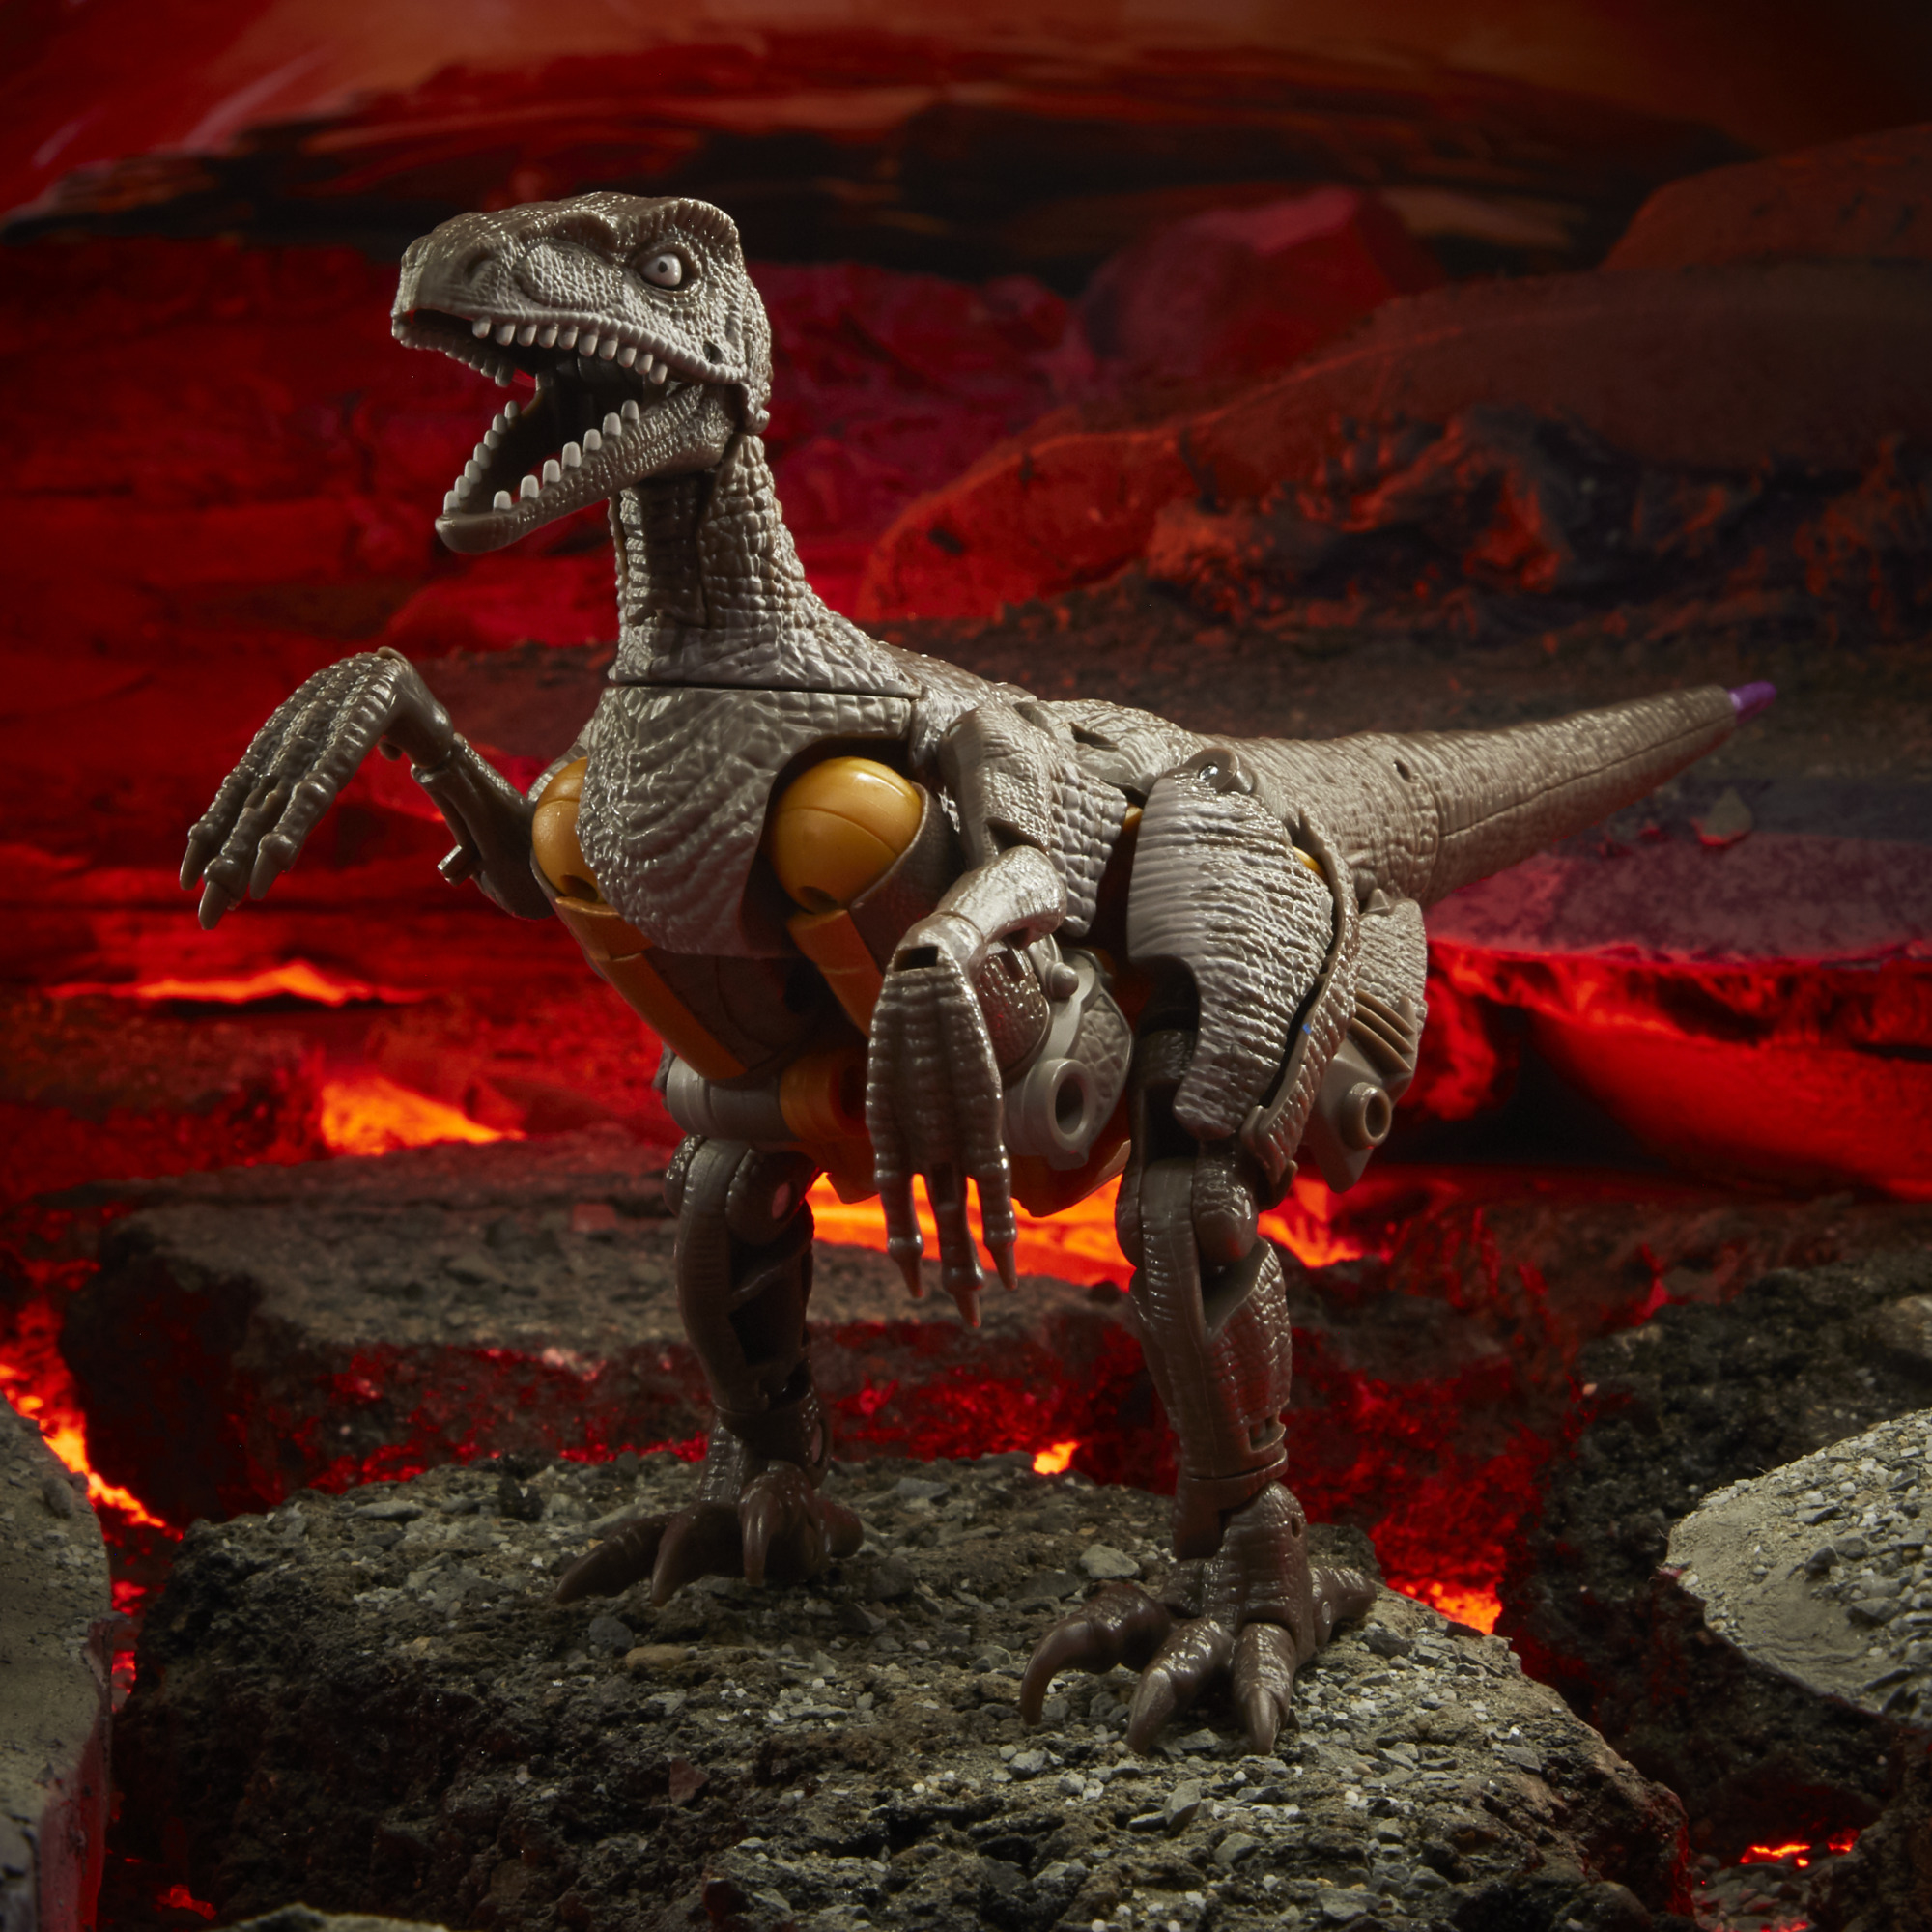 Transformers Generations War for Cybertron: Kingdom - Voyager Dinobot